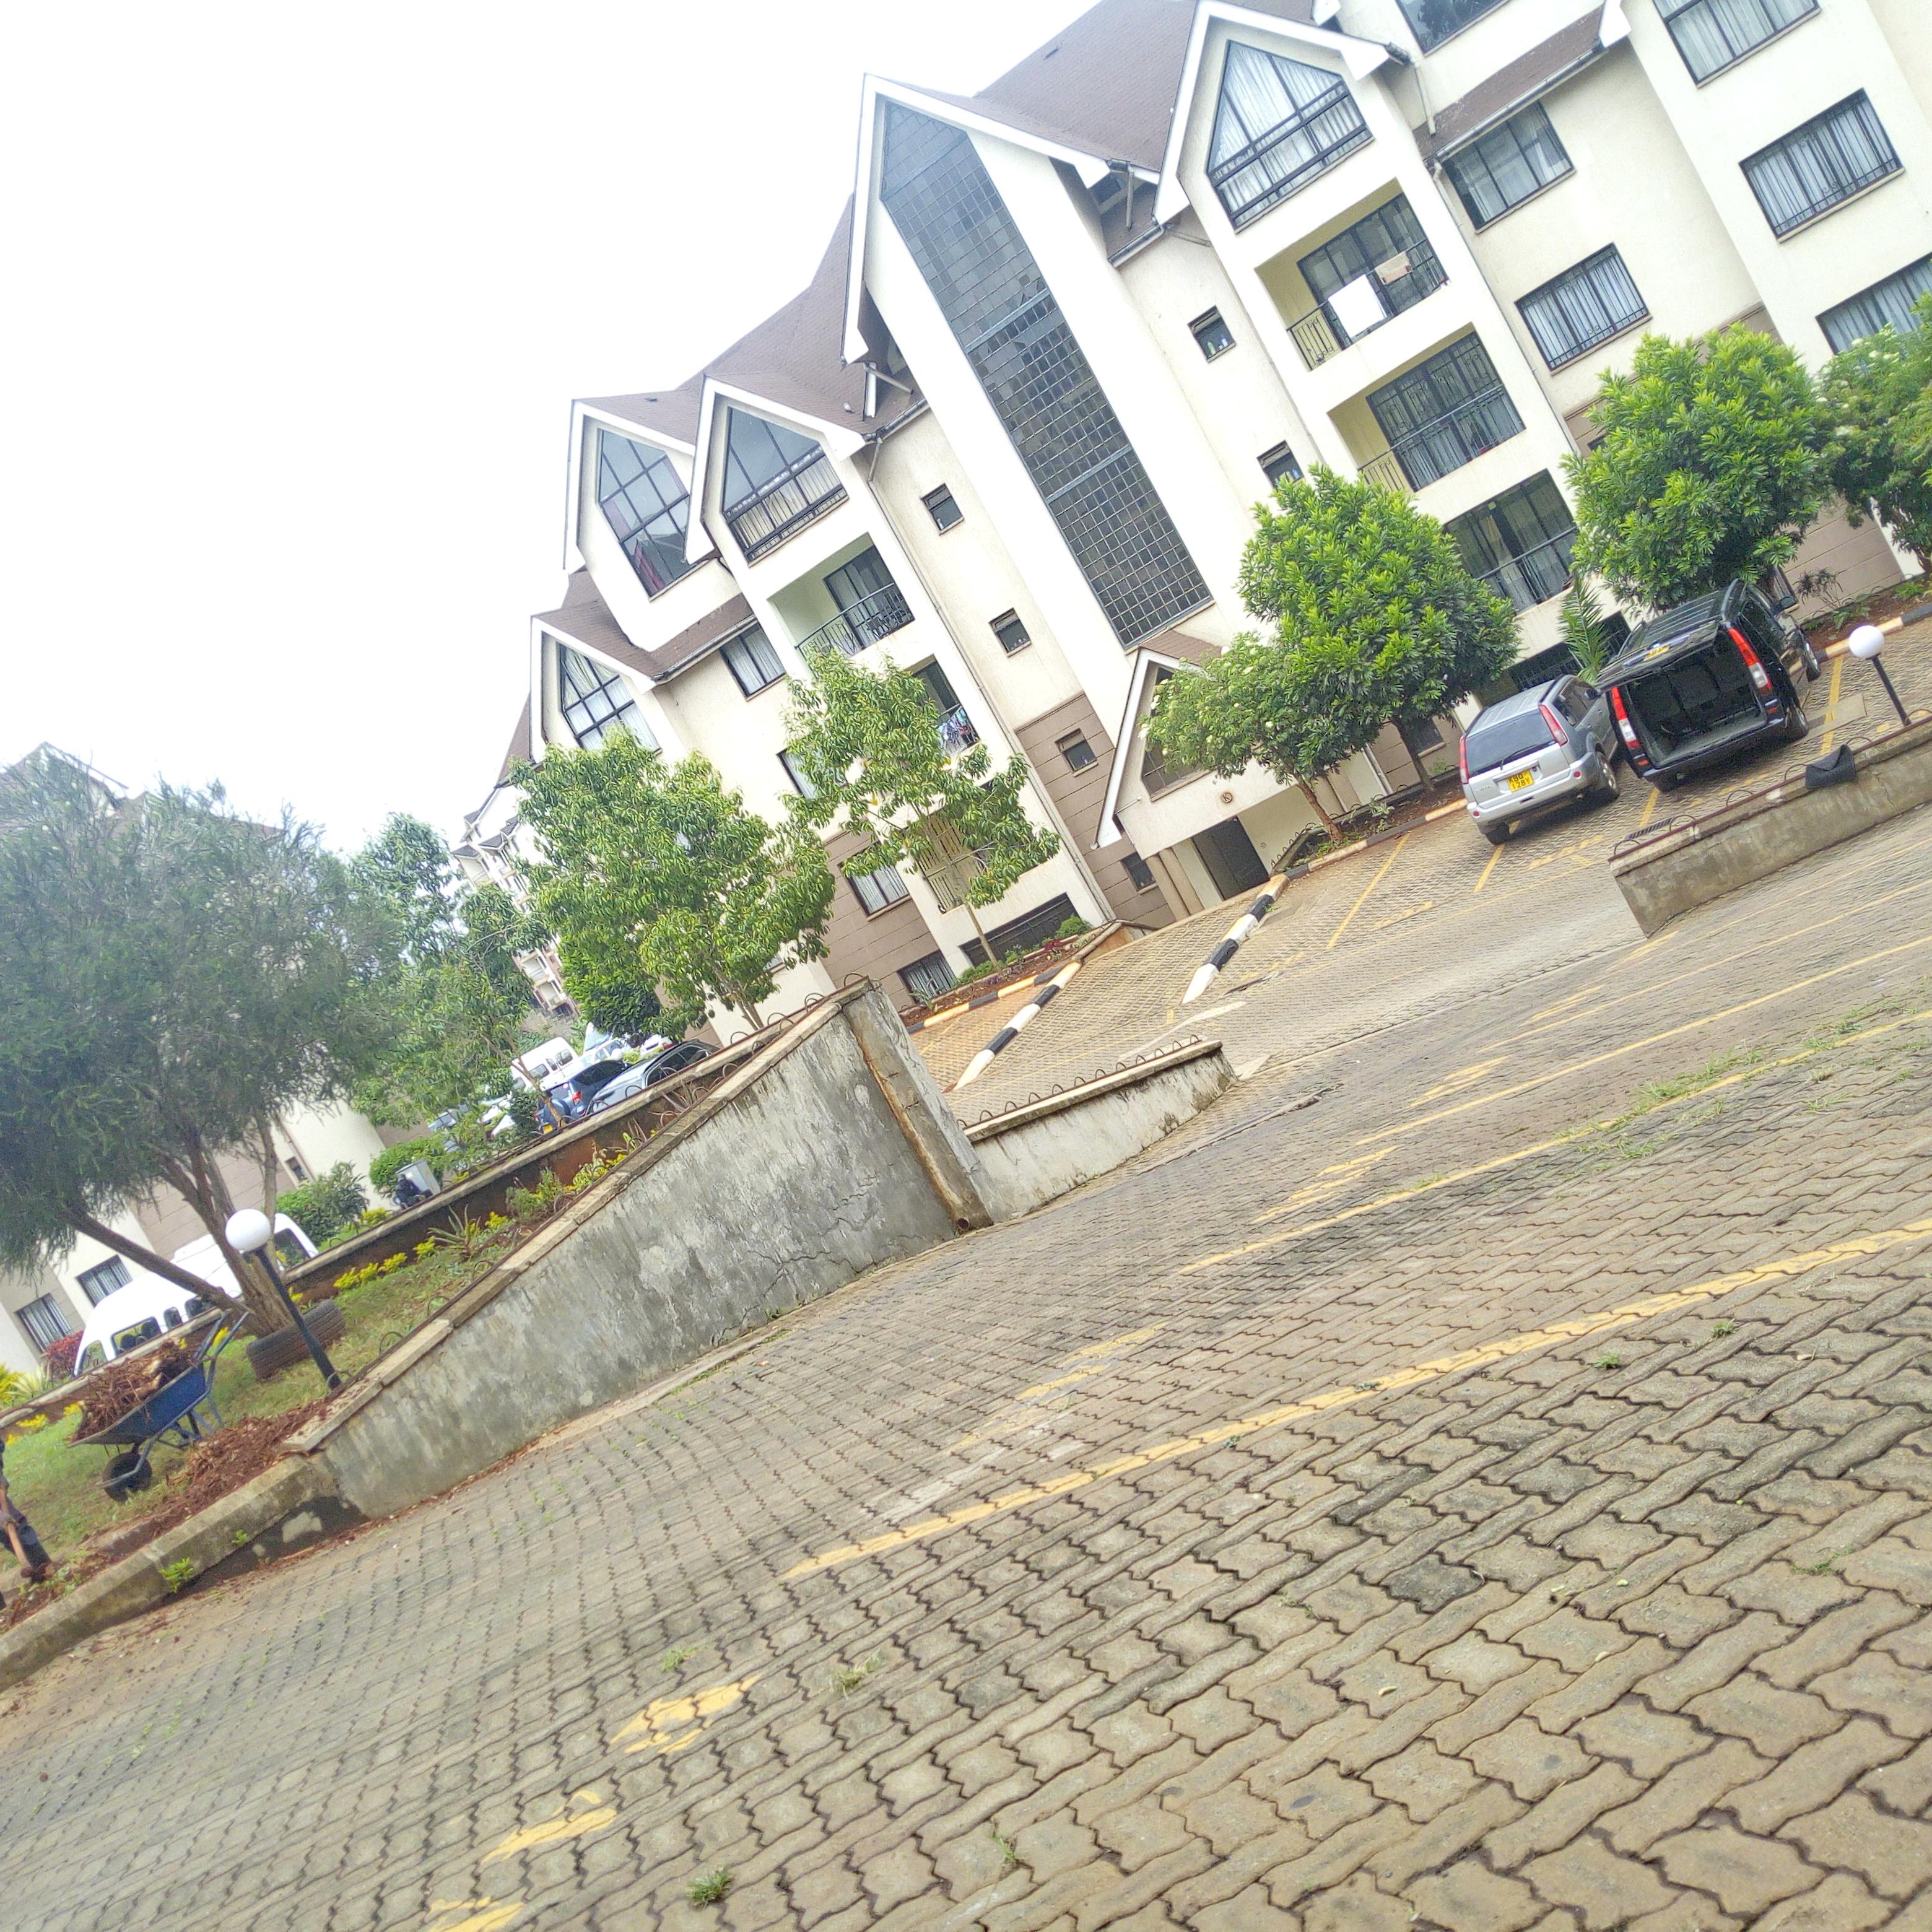 3 bedroom apartments in Loresho estate